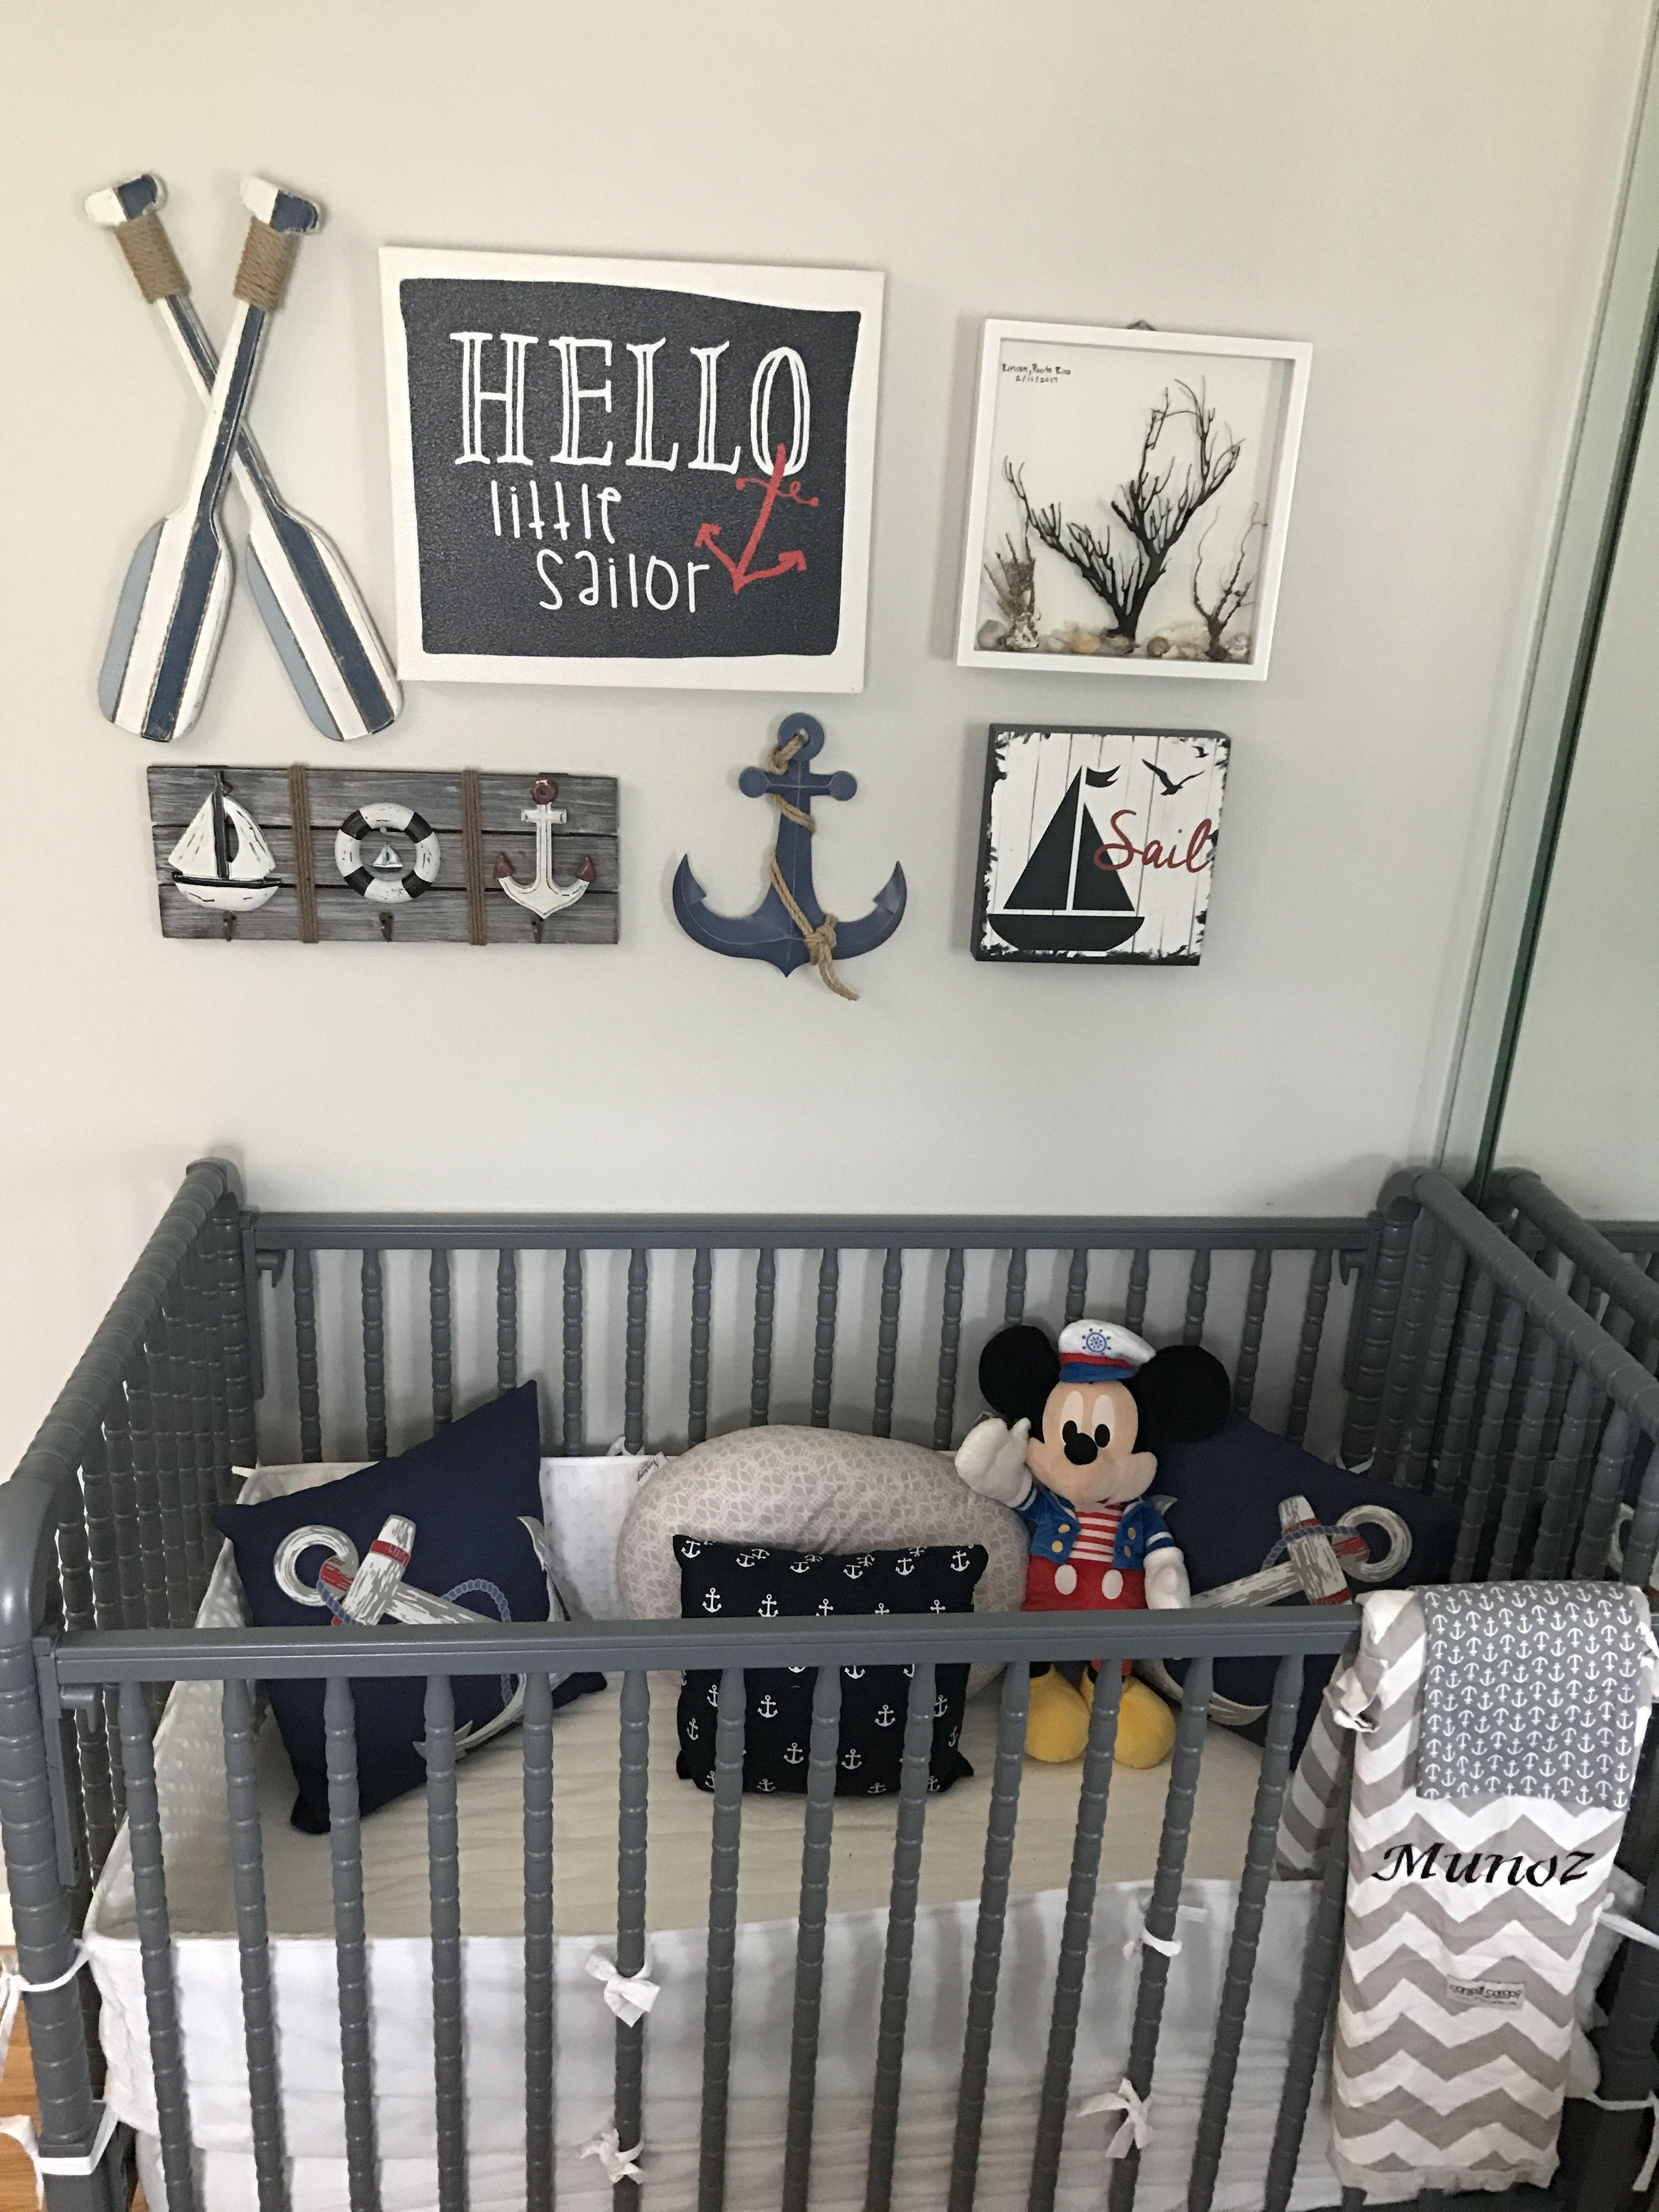 Nautical Baby Boy Nursery Room Ideas: Baby Boy Room Nursery, Baby Nursery